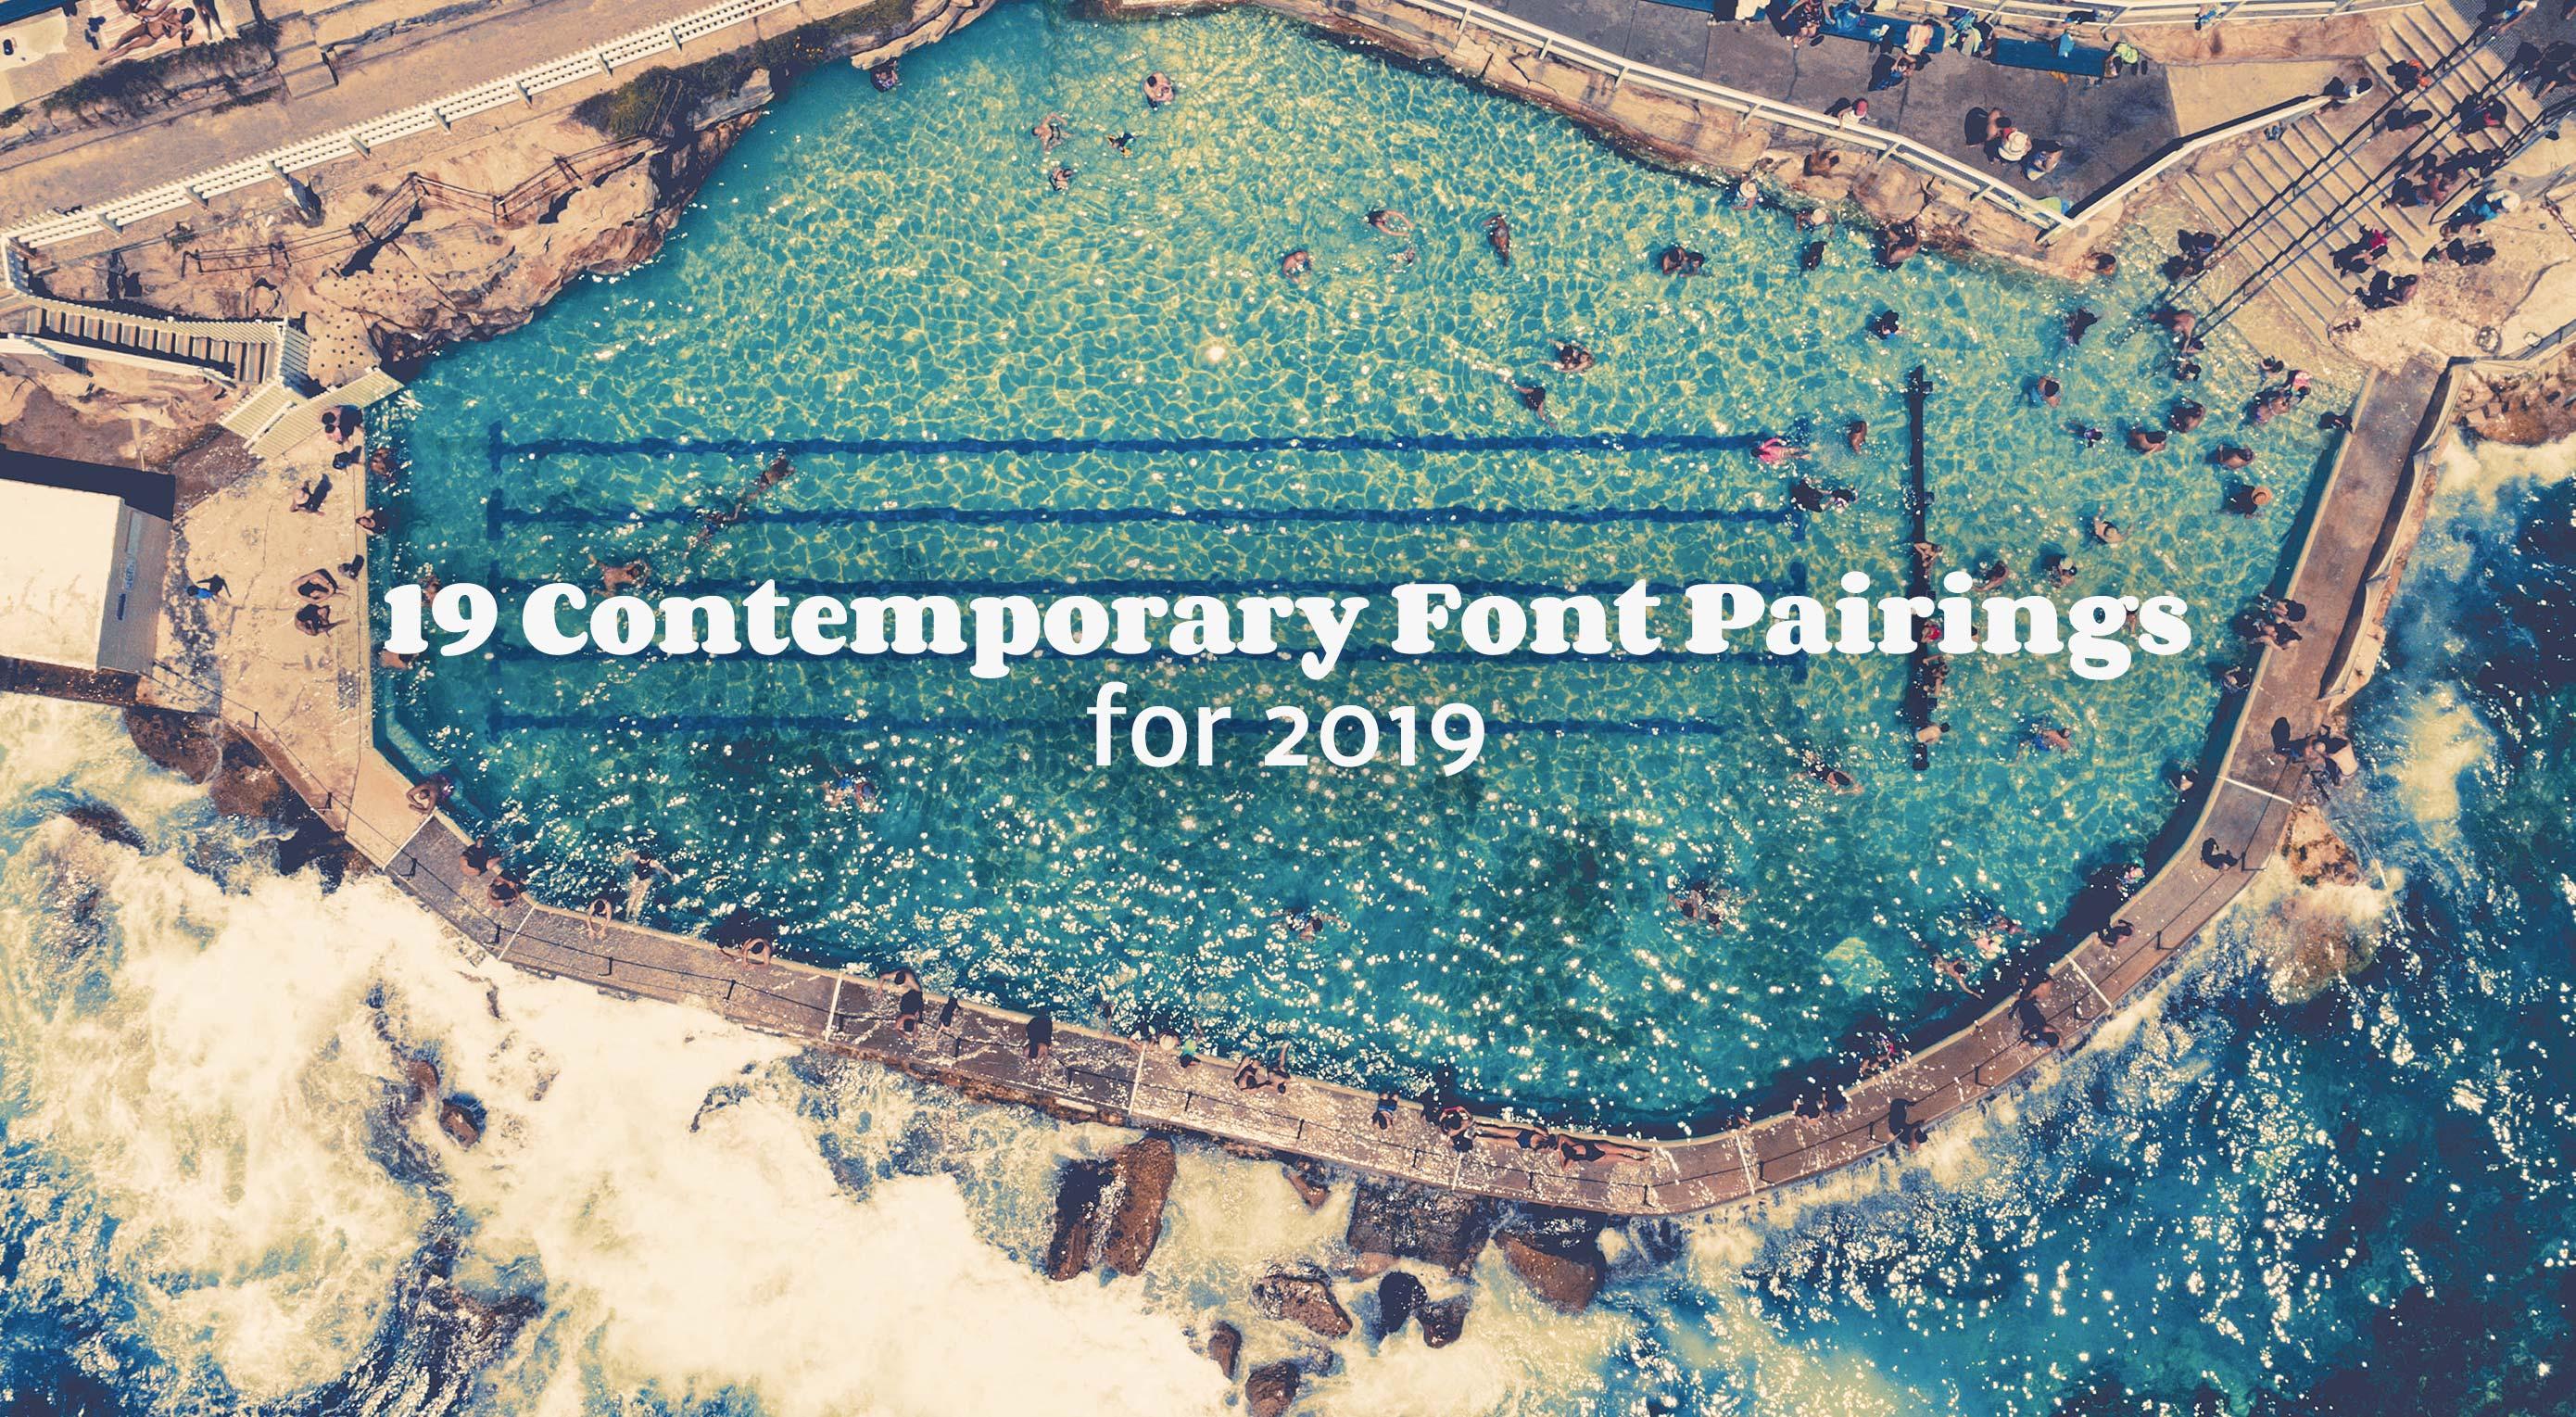 19 Contemporary Font Pairings for 2019 | Webdesigner Depot